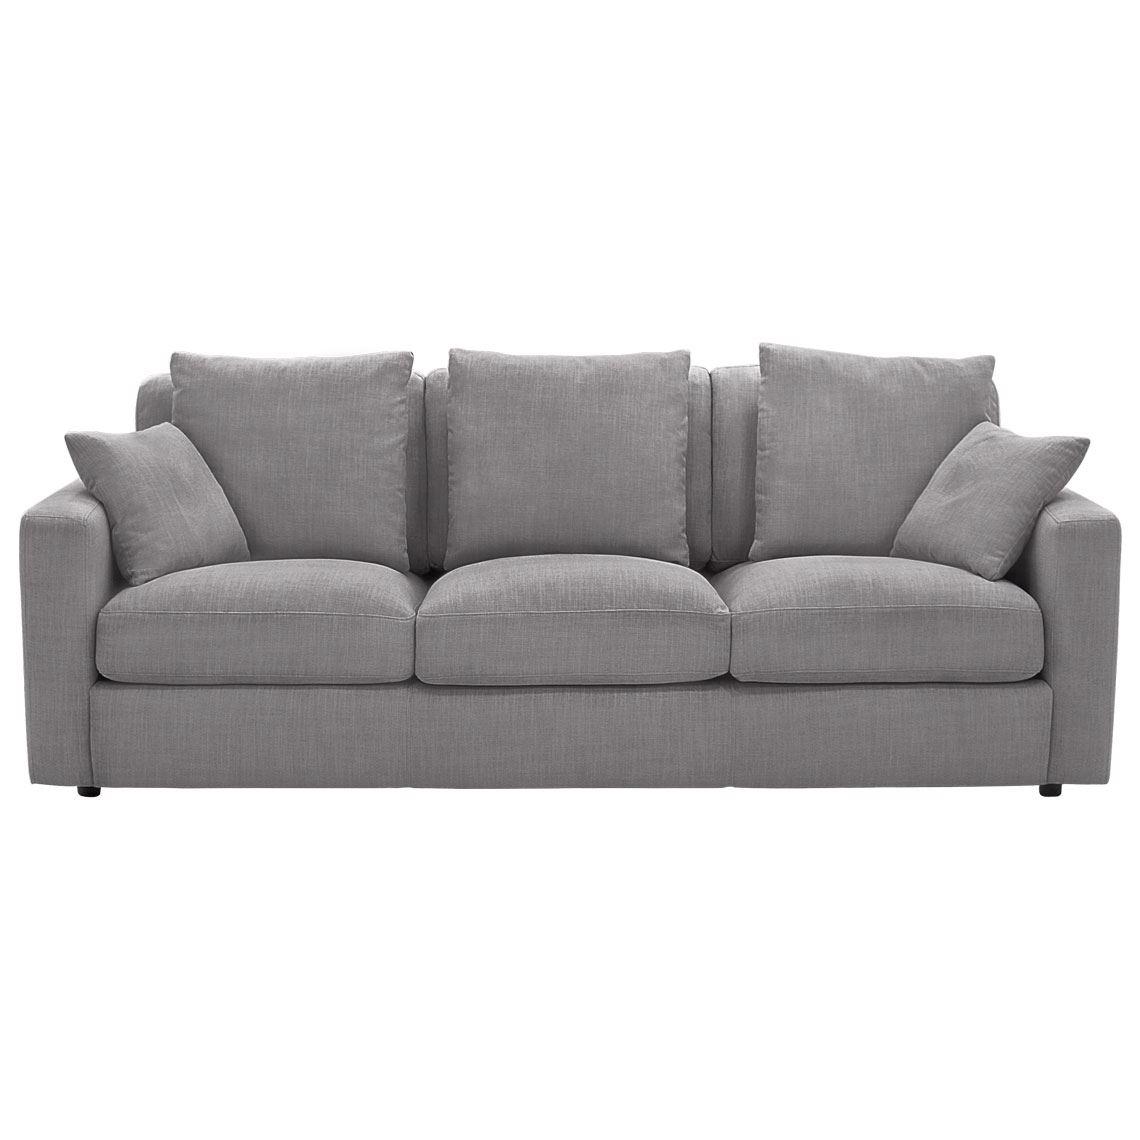 Benson 3 Seat Fabric Sofa Donkey With Images Sofa Fabric Sofa Seating